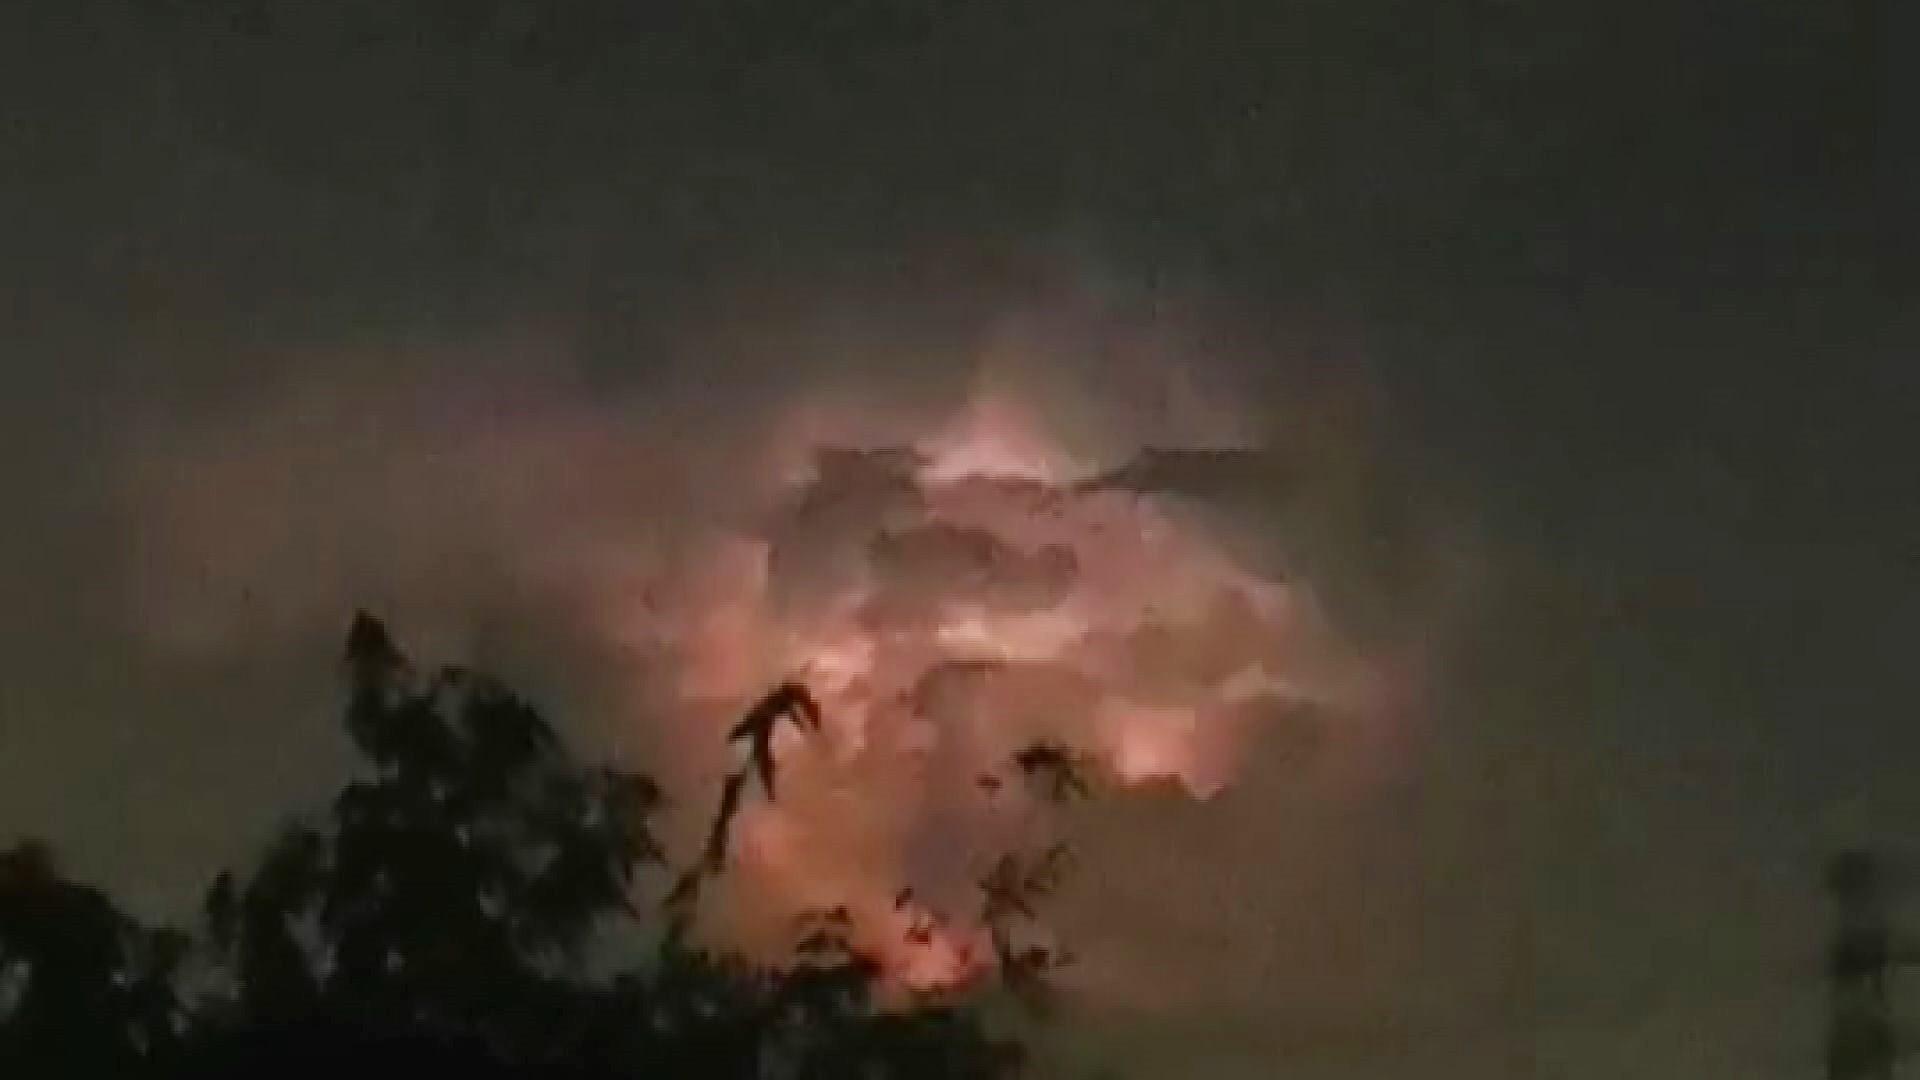 Langit malam Taichung diselimuti percikan cahaya tanpa bunyi gemuruh